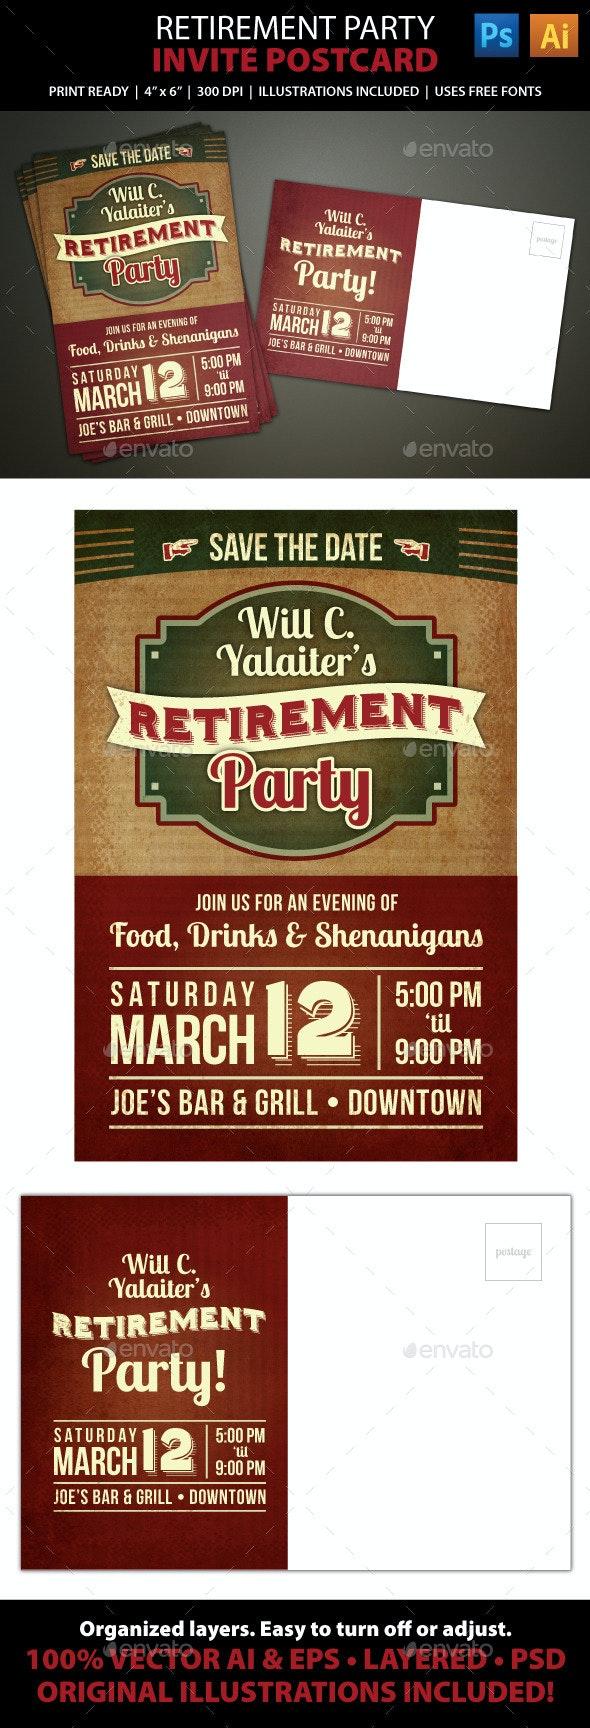 Retirement Party Postcard Invitation - Invitations Cards & Invites